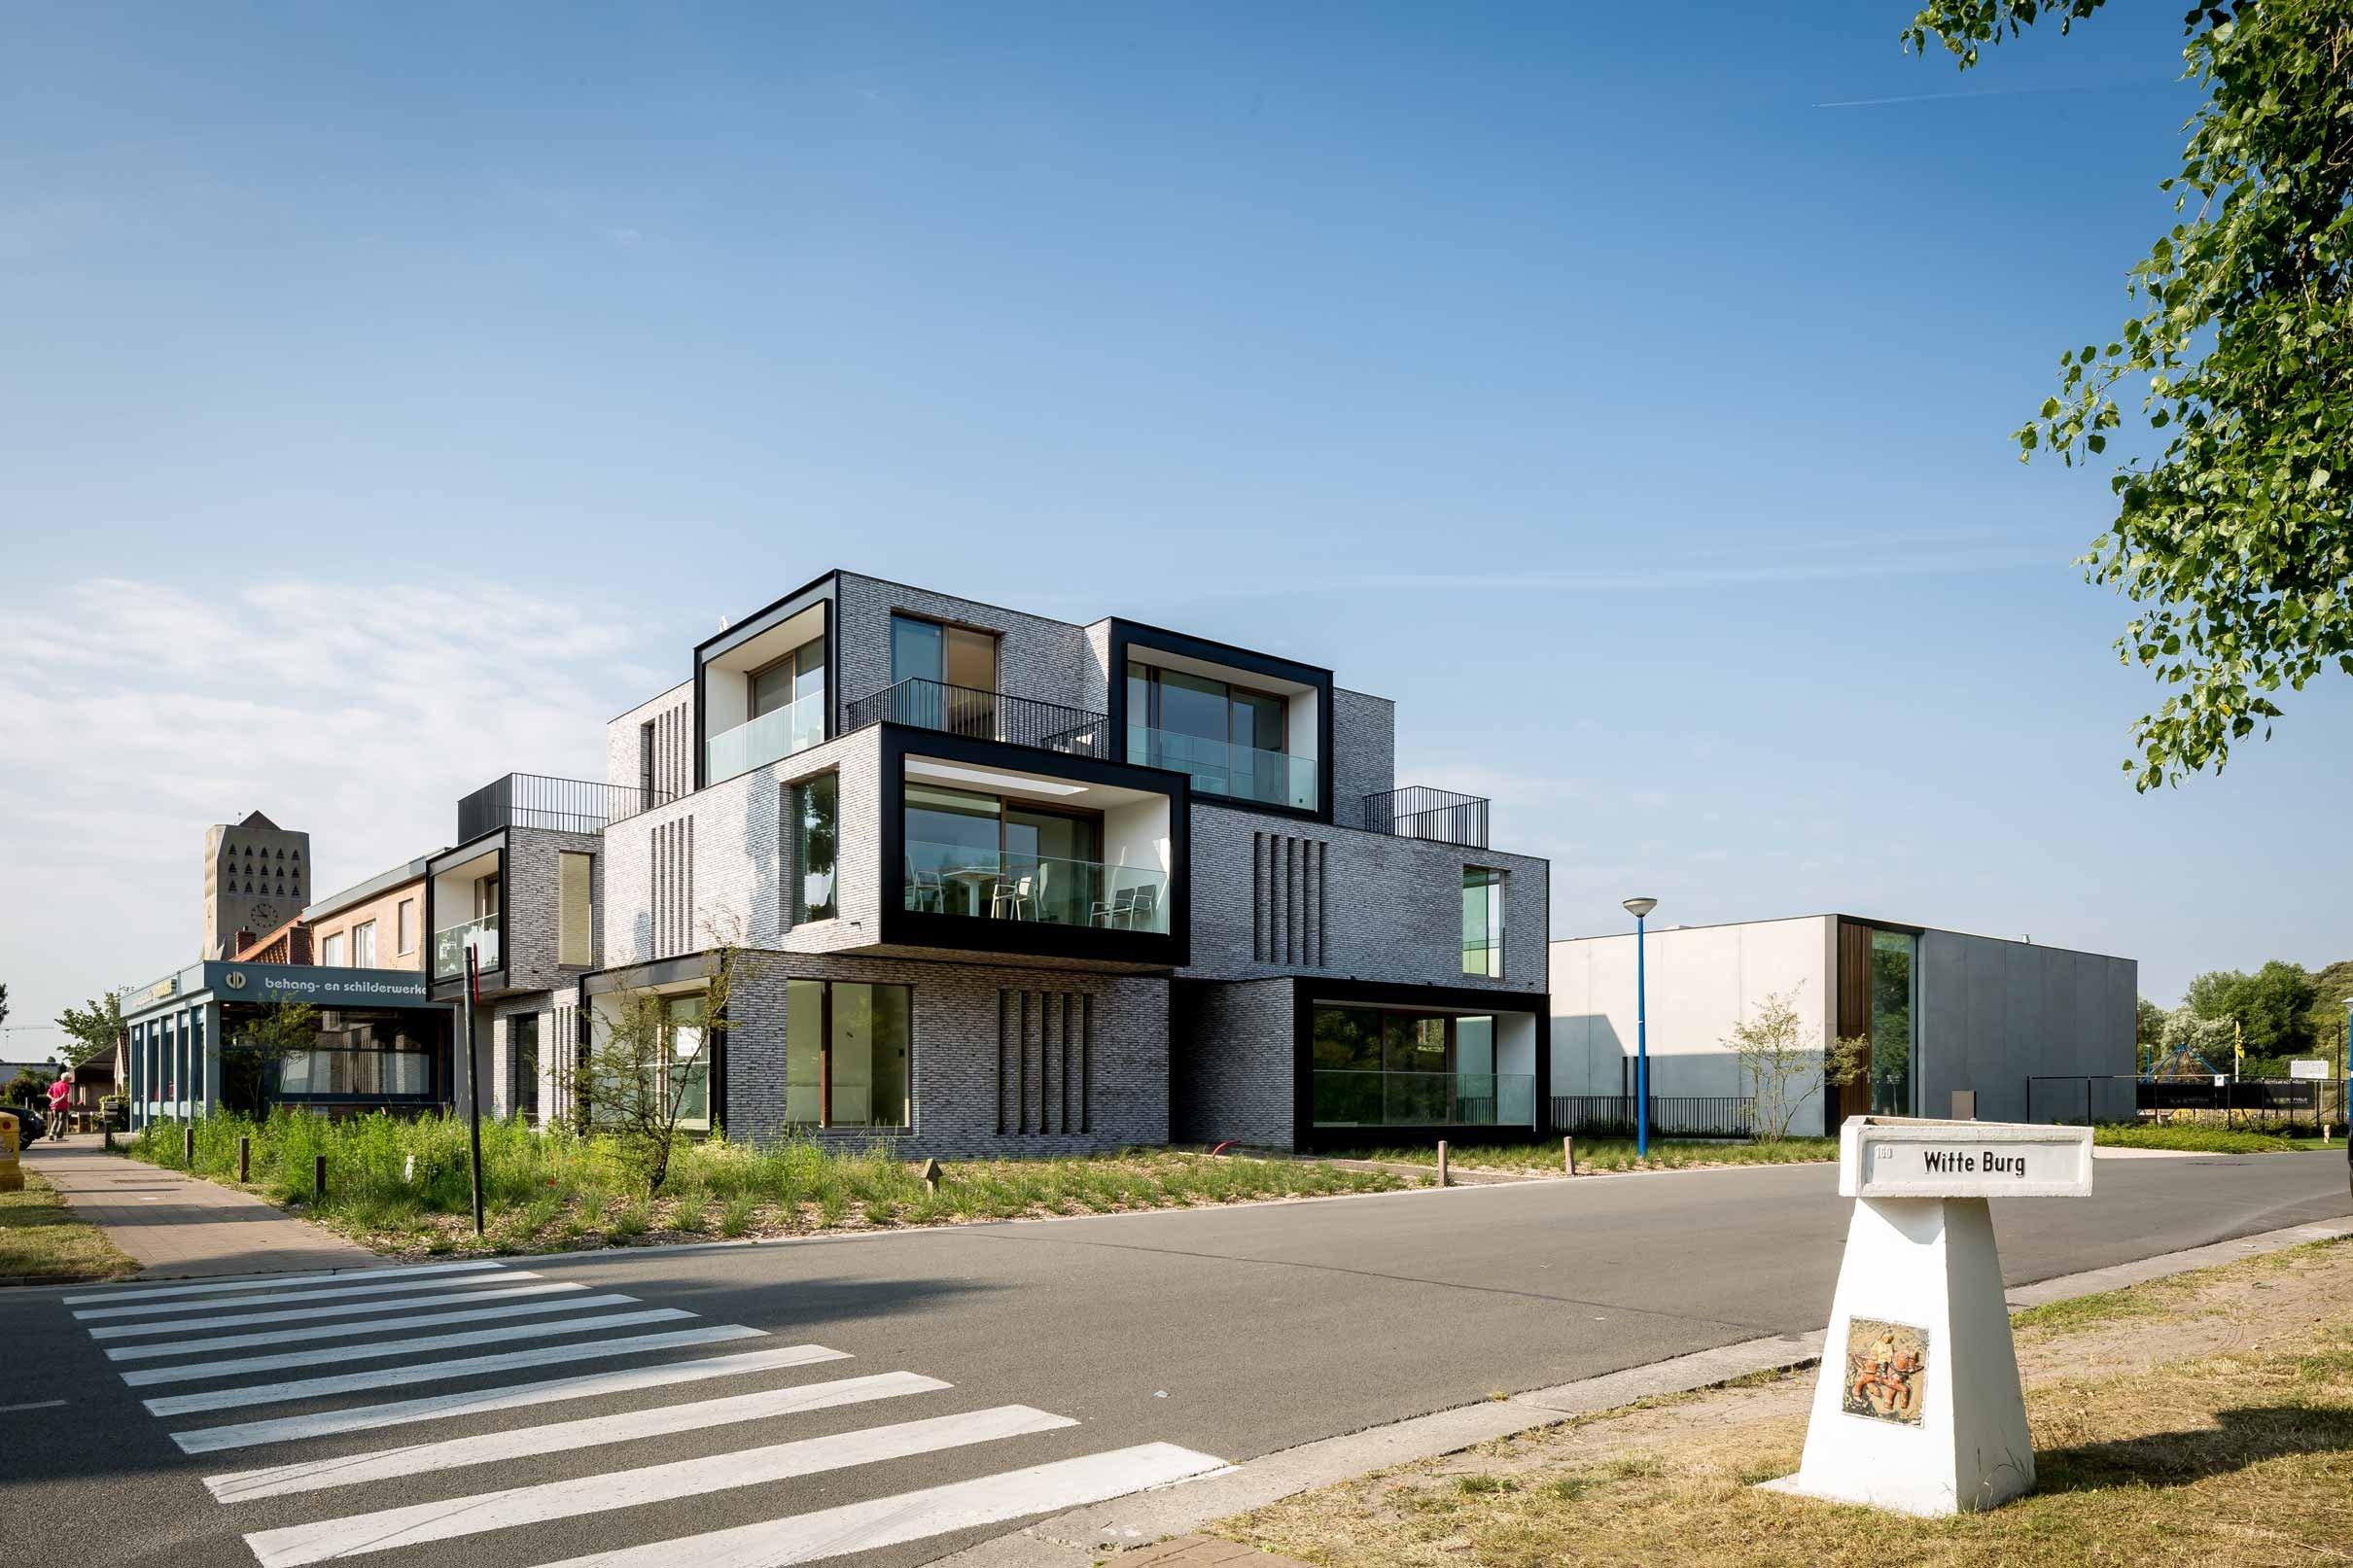 Rietveldprojects.be-Bauhaus-appartement-design-architectuur-kust